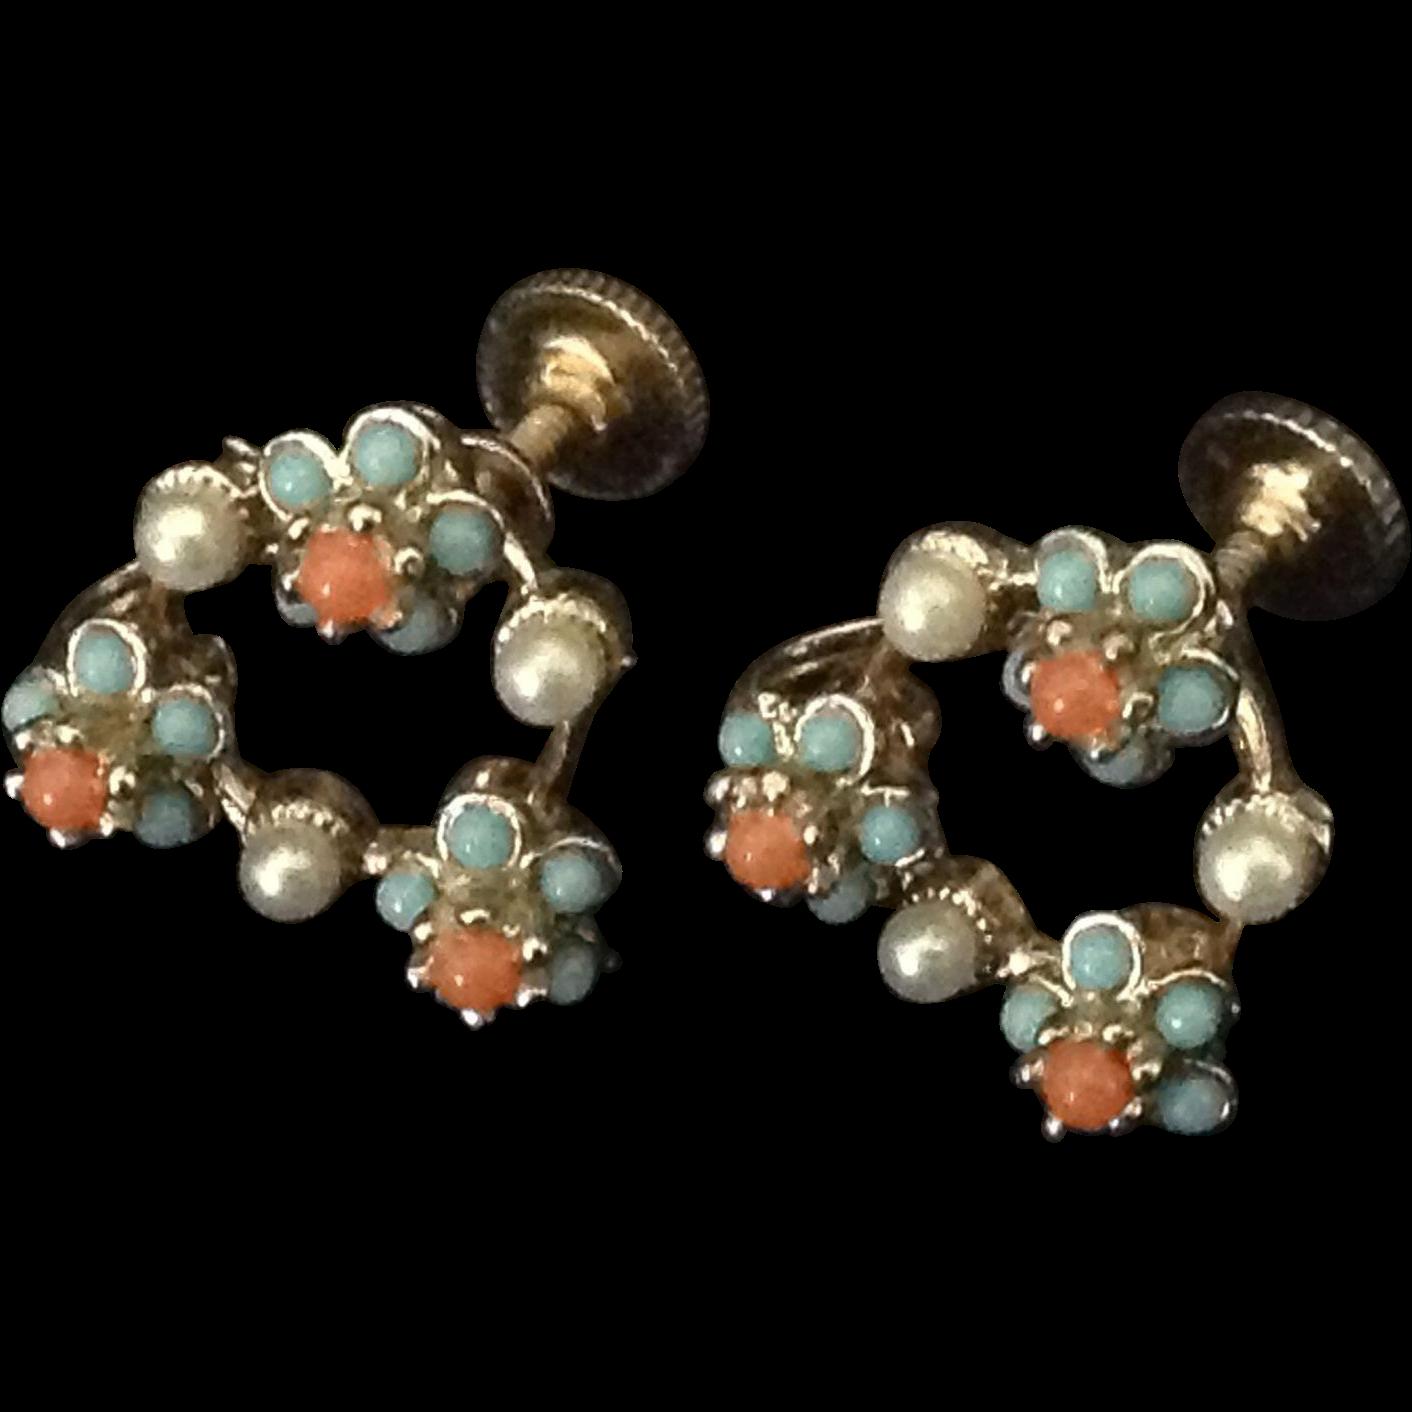 Dainty flower bead and faux pearl earrings